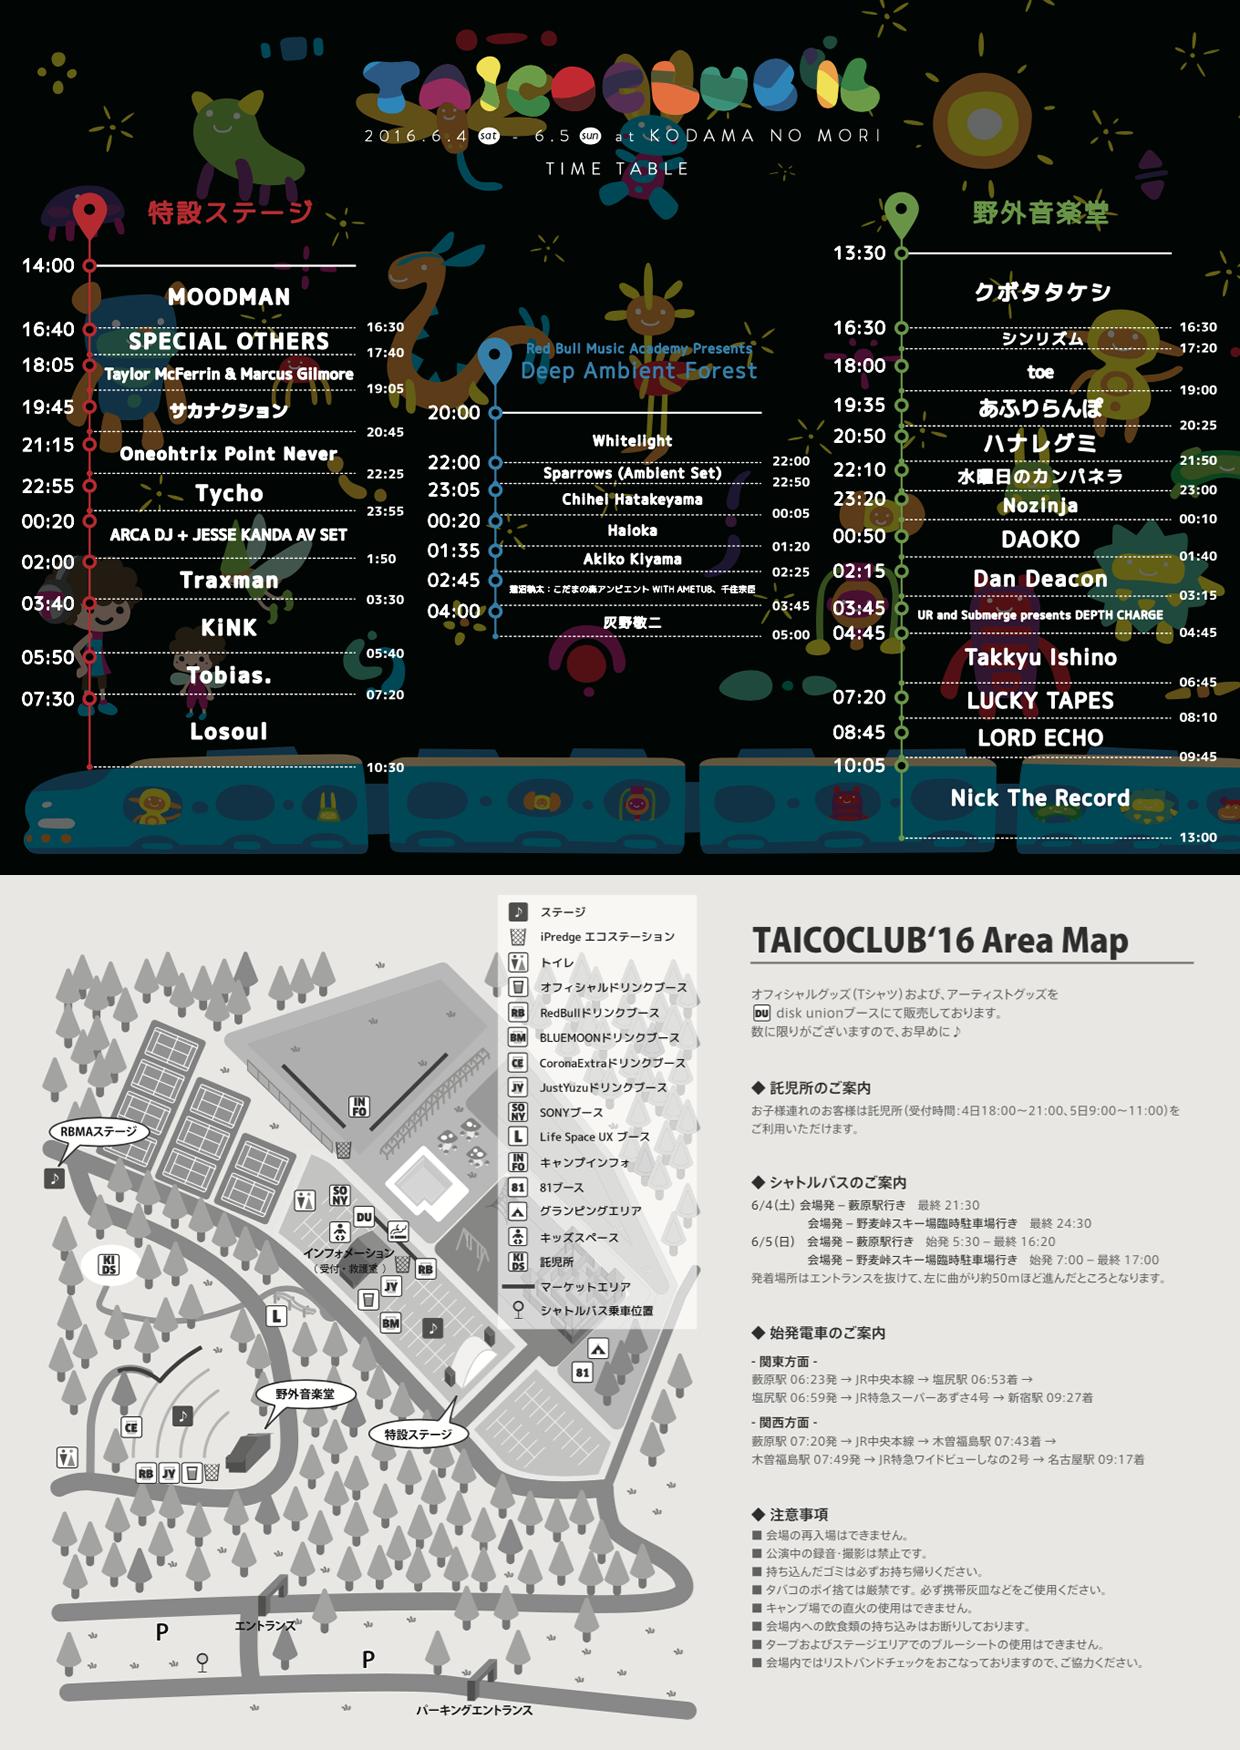 taicoclub timetable